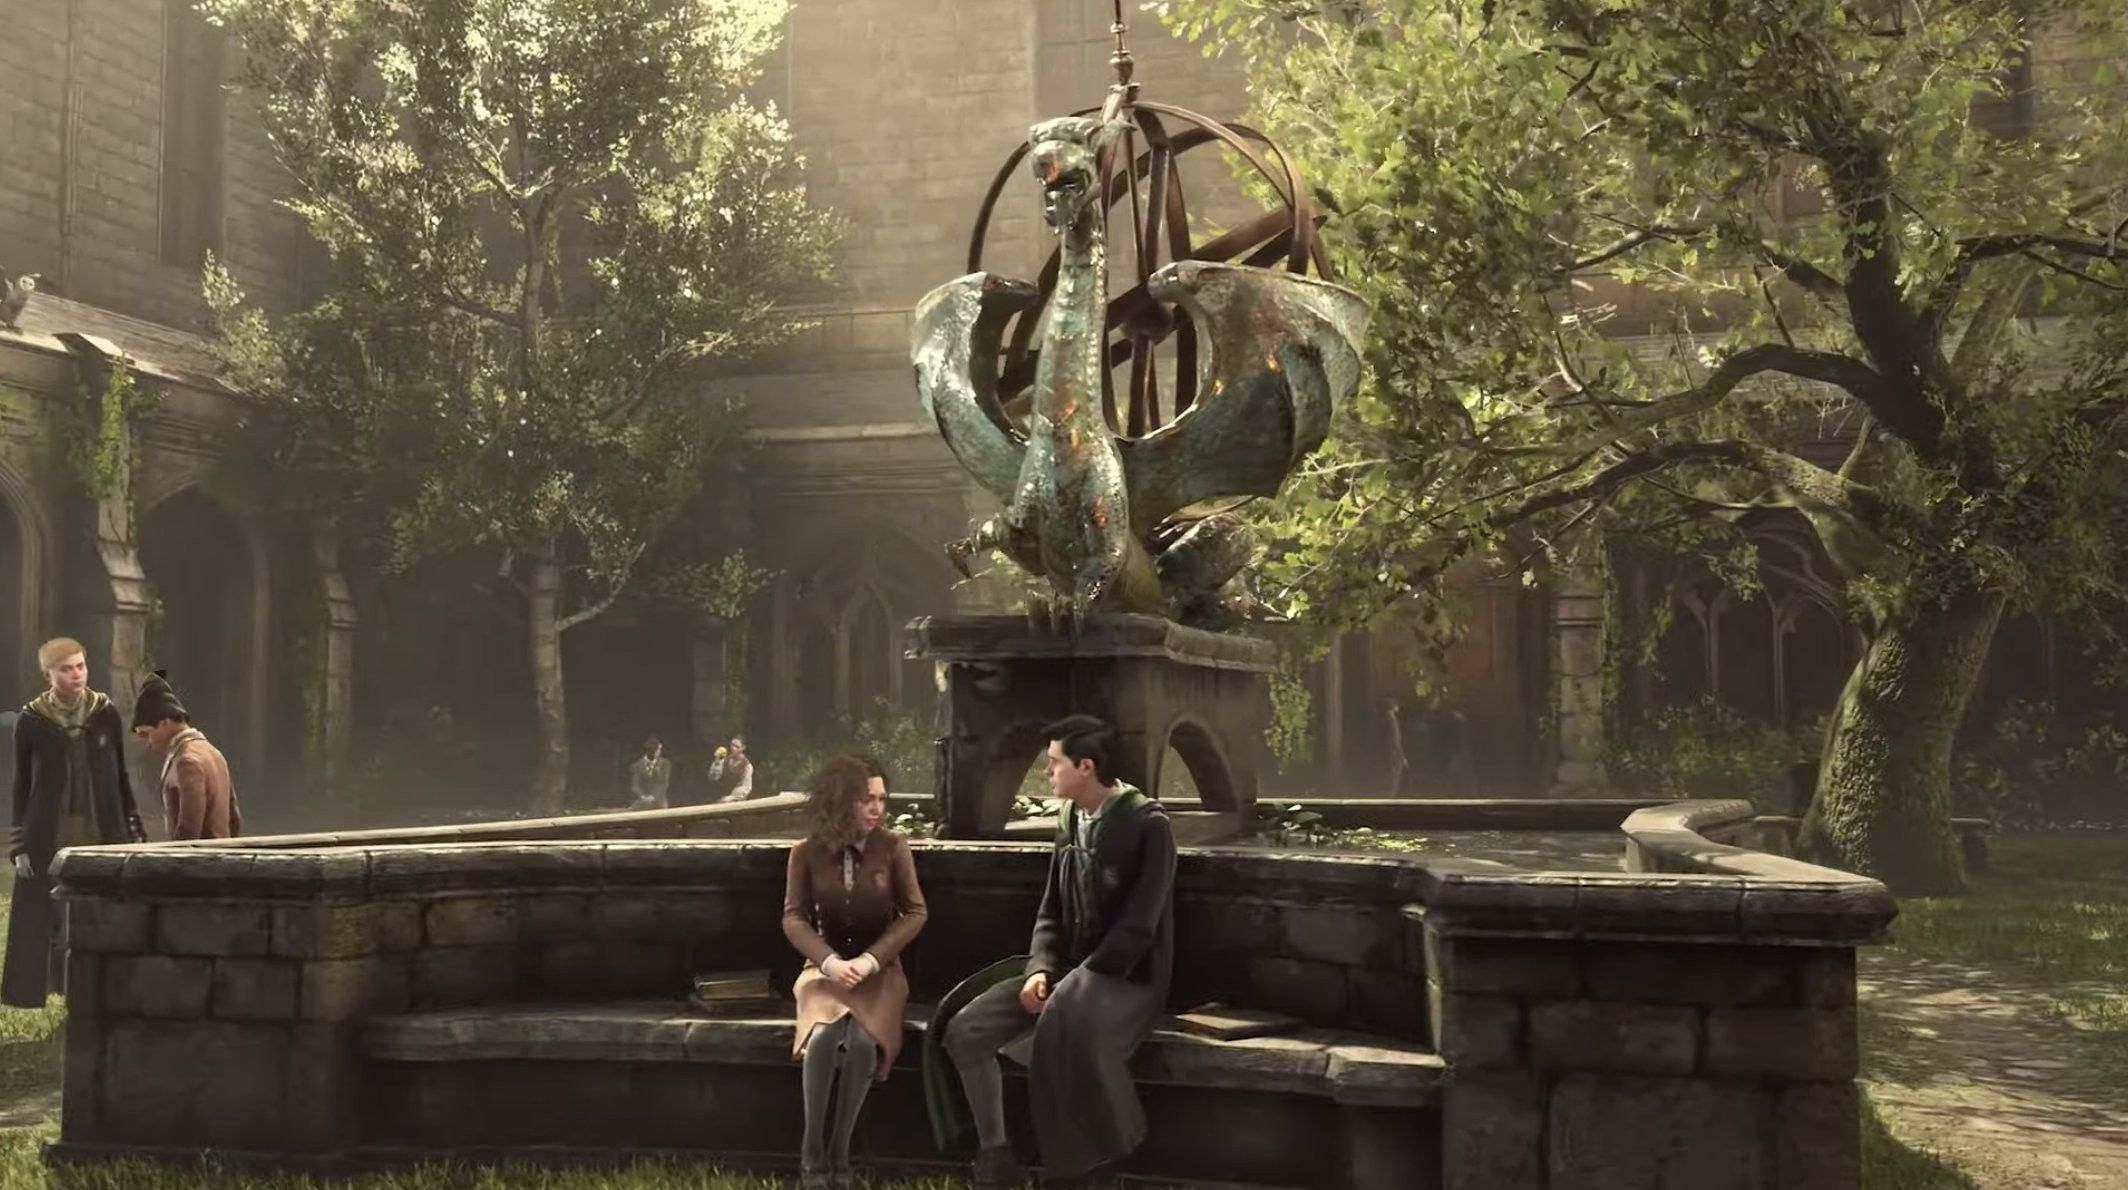 Pin By Jai James On Media Movies Games Print Tv Hogwarts Wizarding World Hp Harry Potter